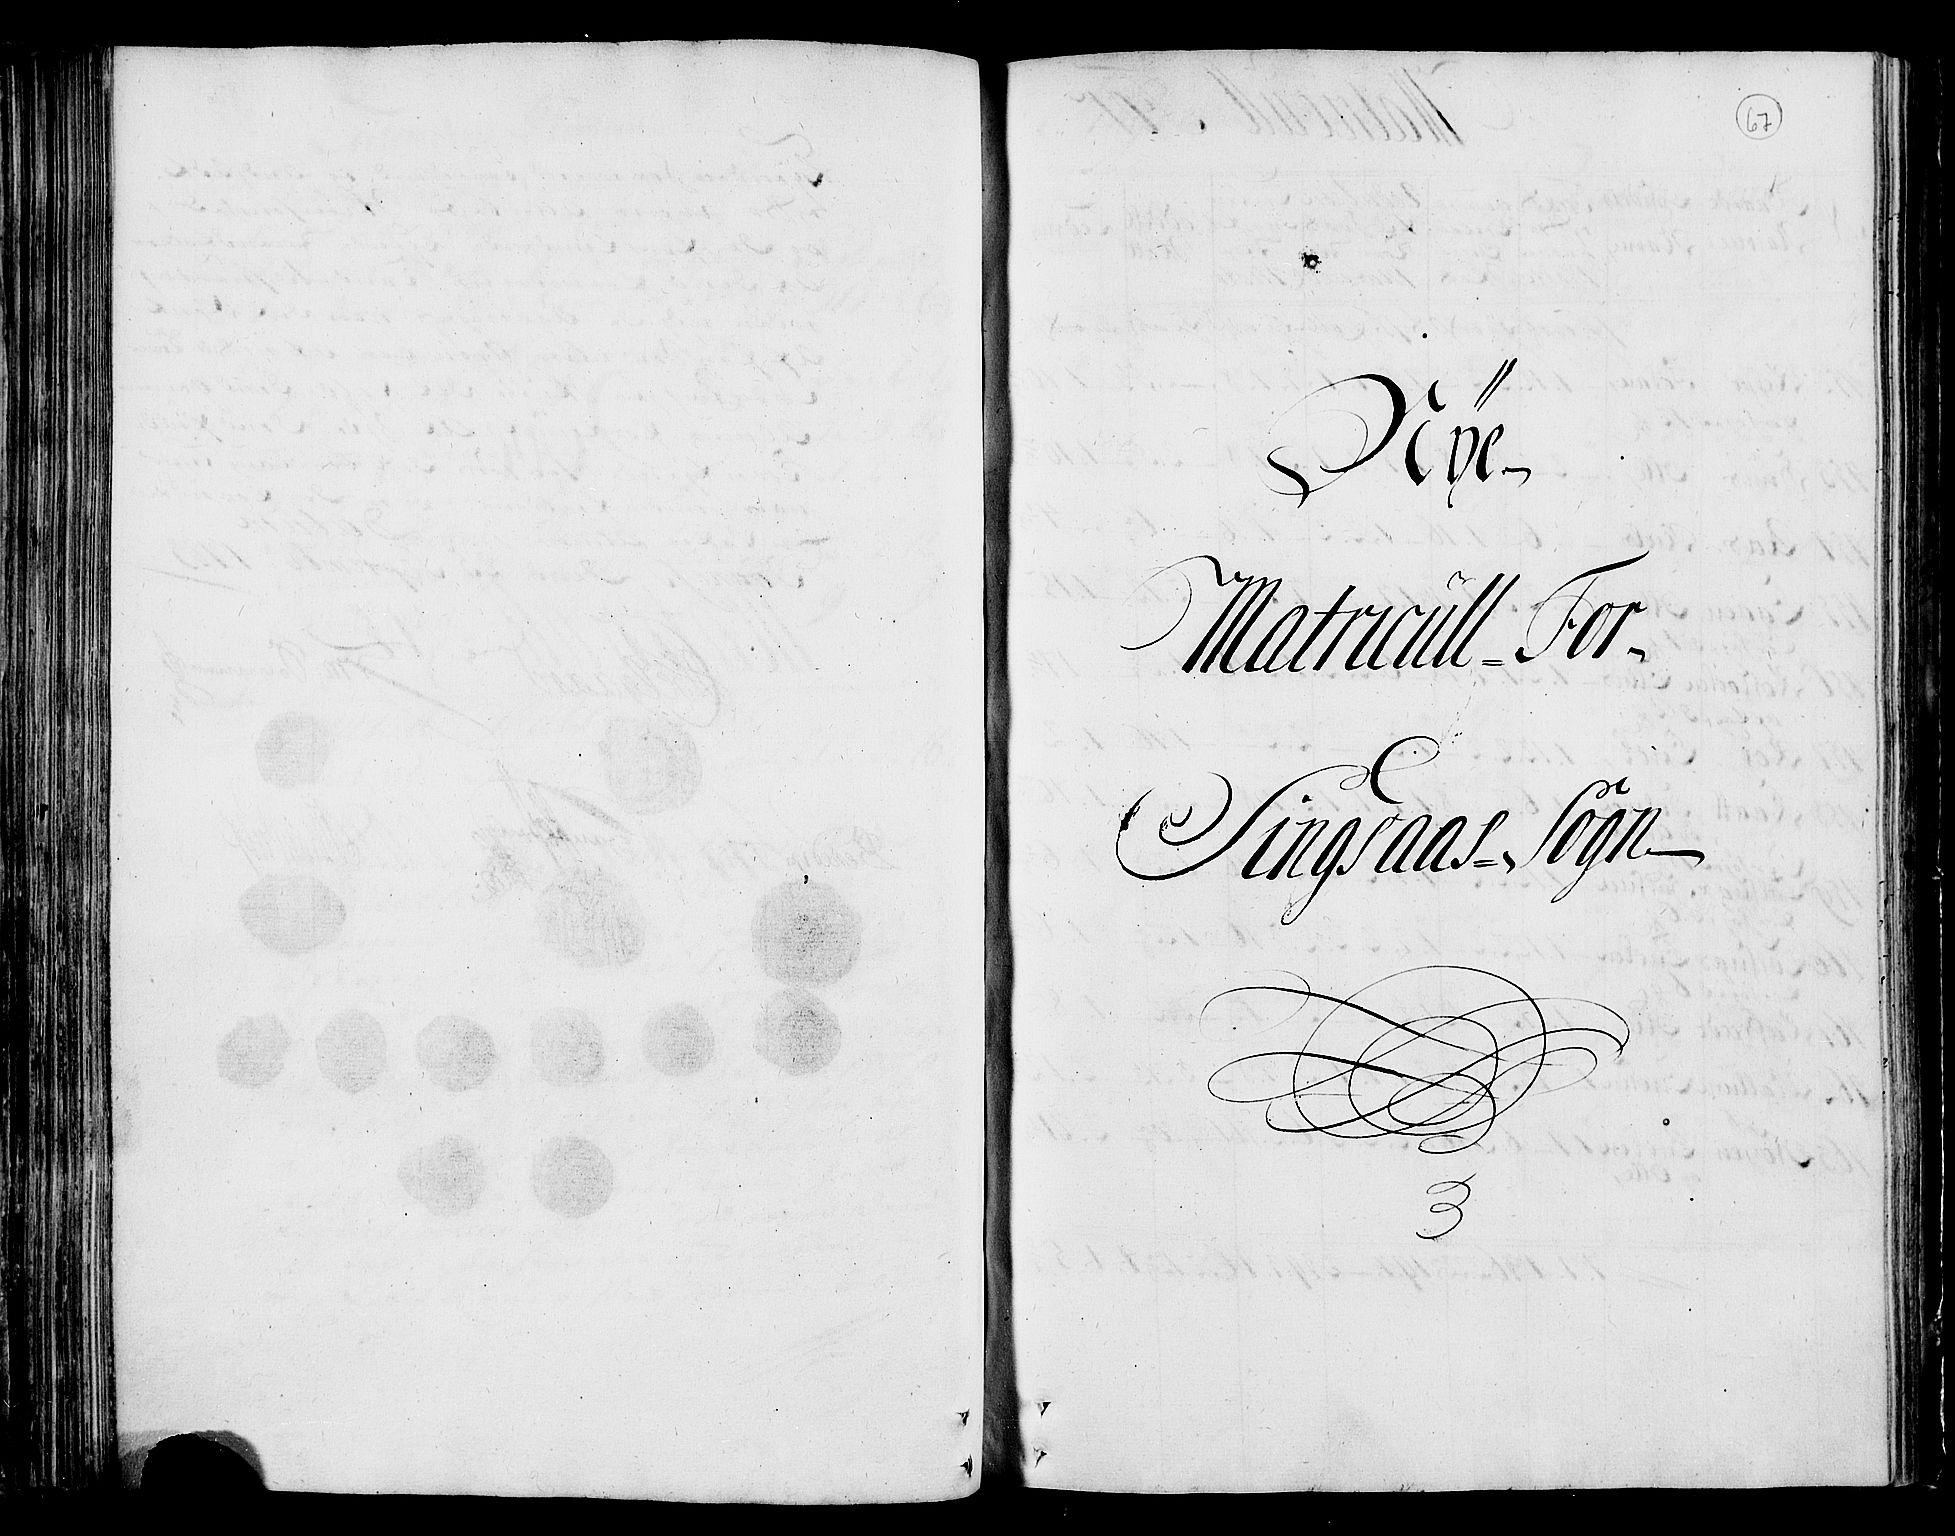 RA, Rentekammeret inntil 1814, Realistisk ordnet avdeling, N/Nb/Nbf/L0159: Gauldal matrikkelprotokoll, 1723, s. 66b-67a